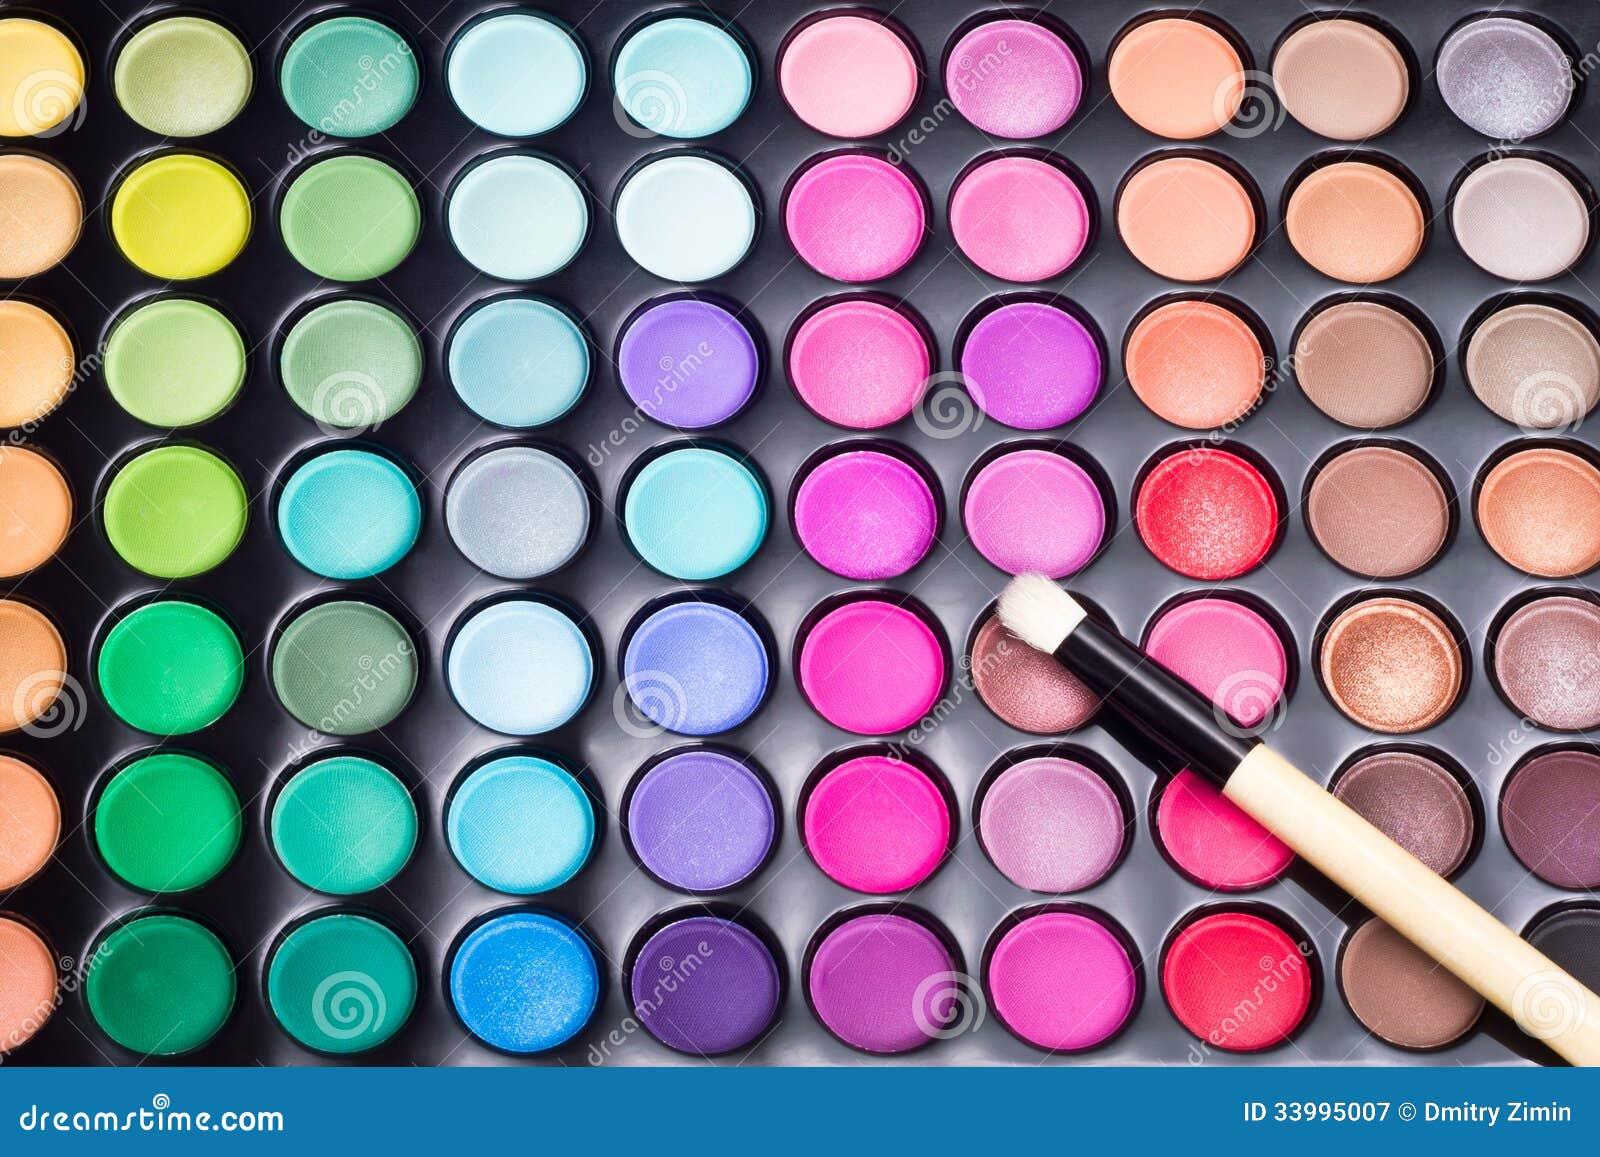 animated makeup wallpaper - photo #46